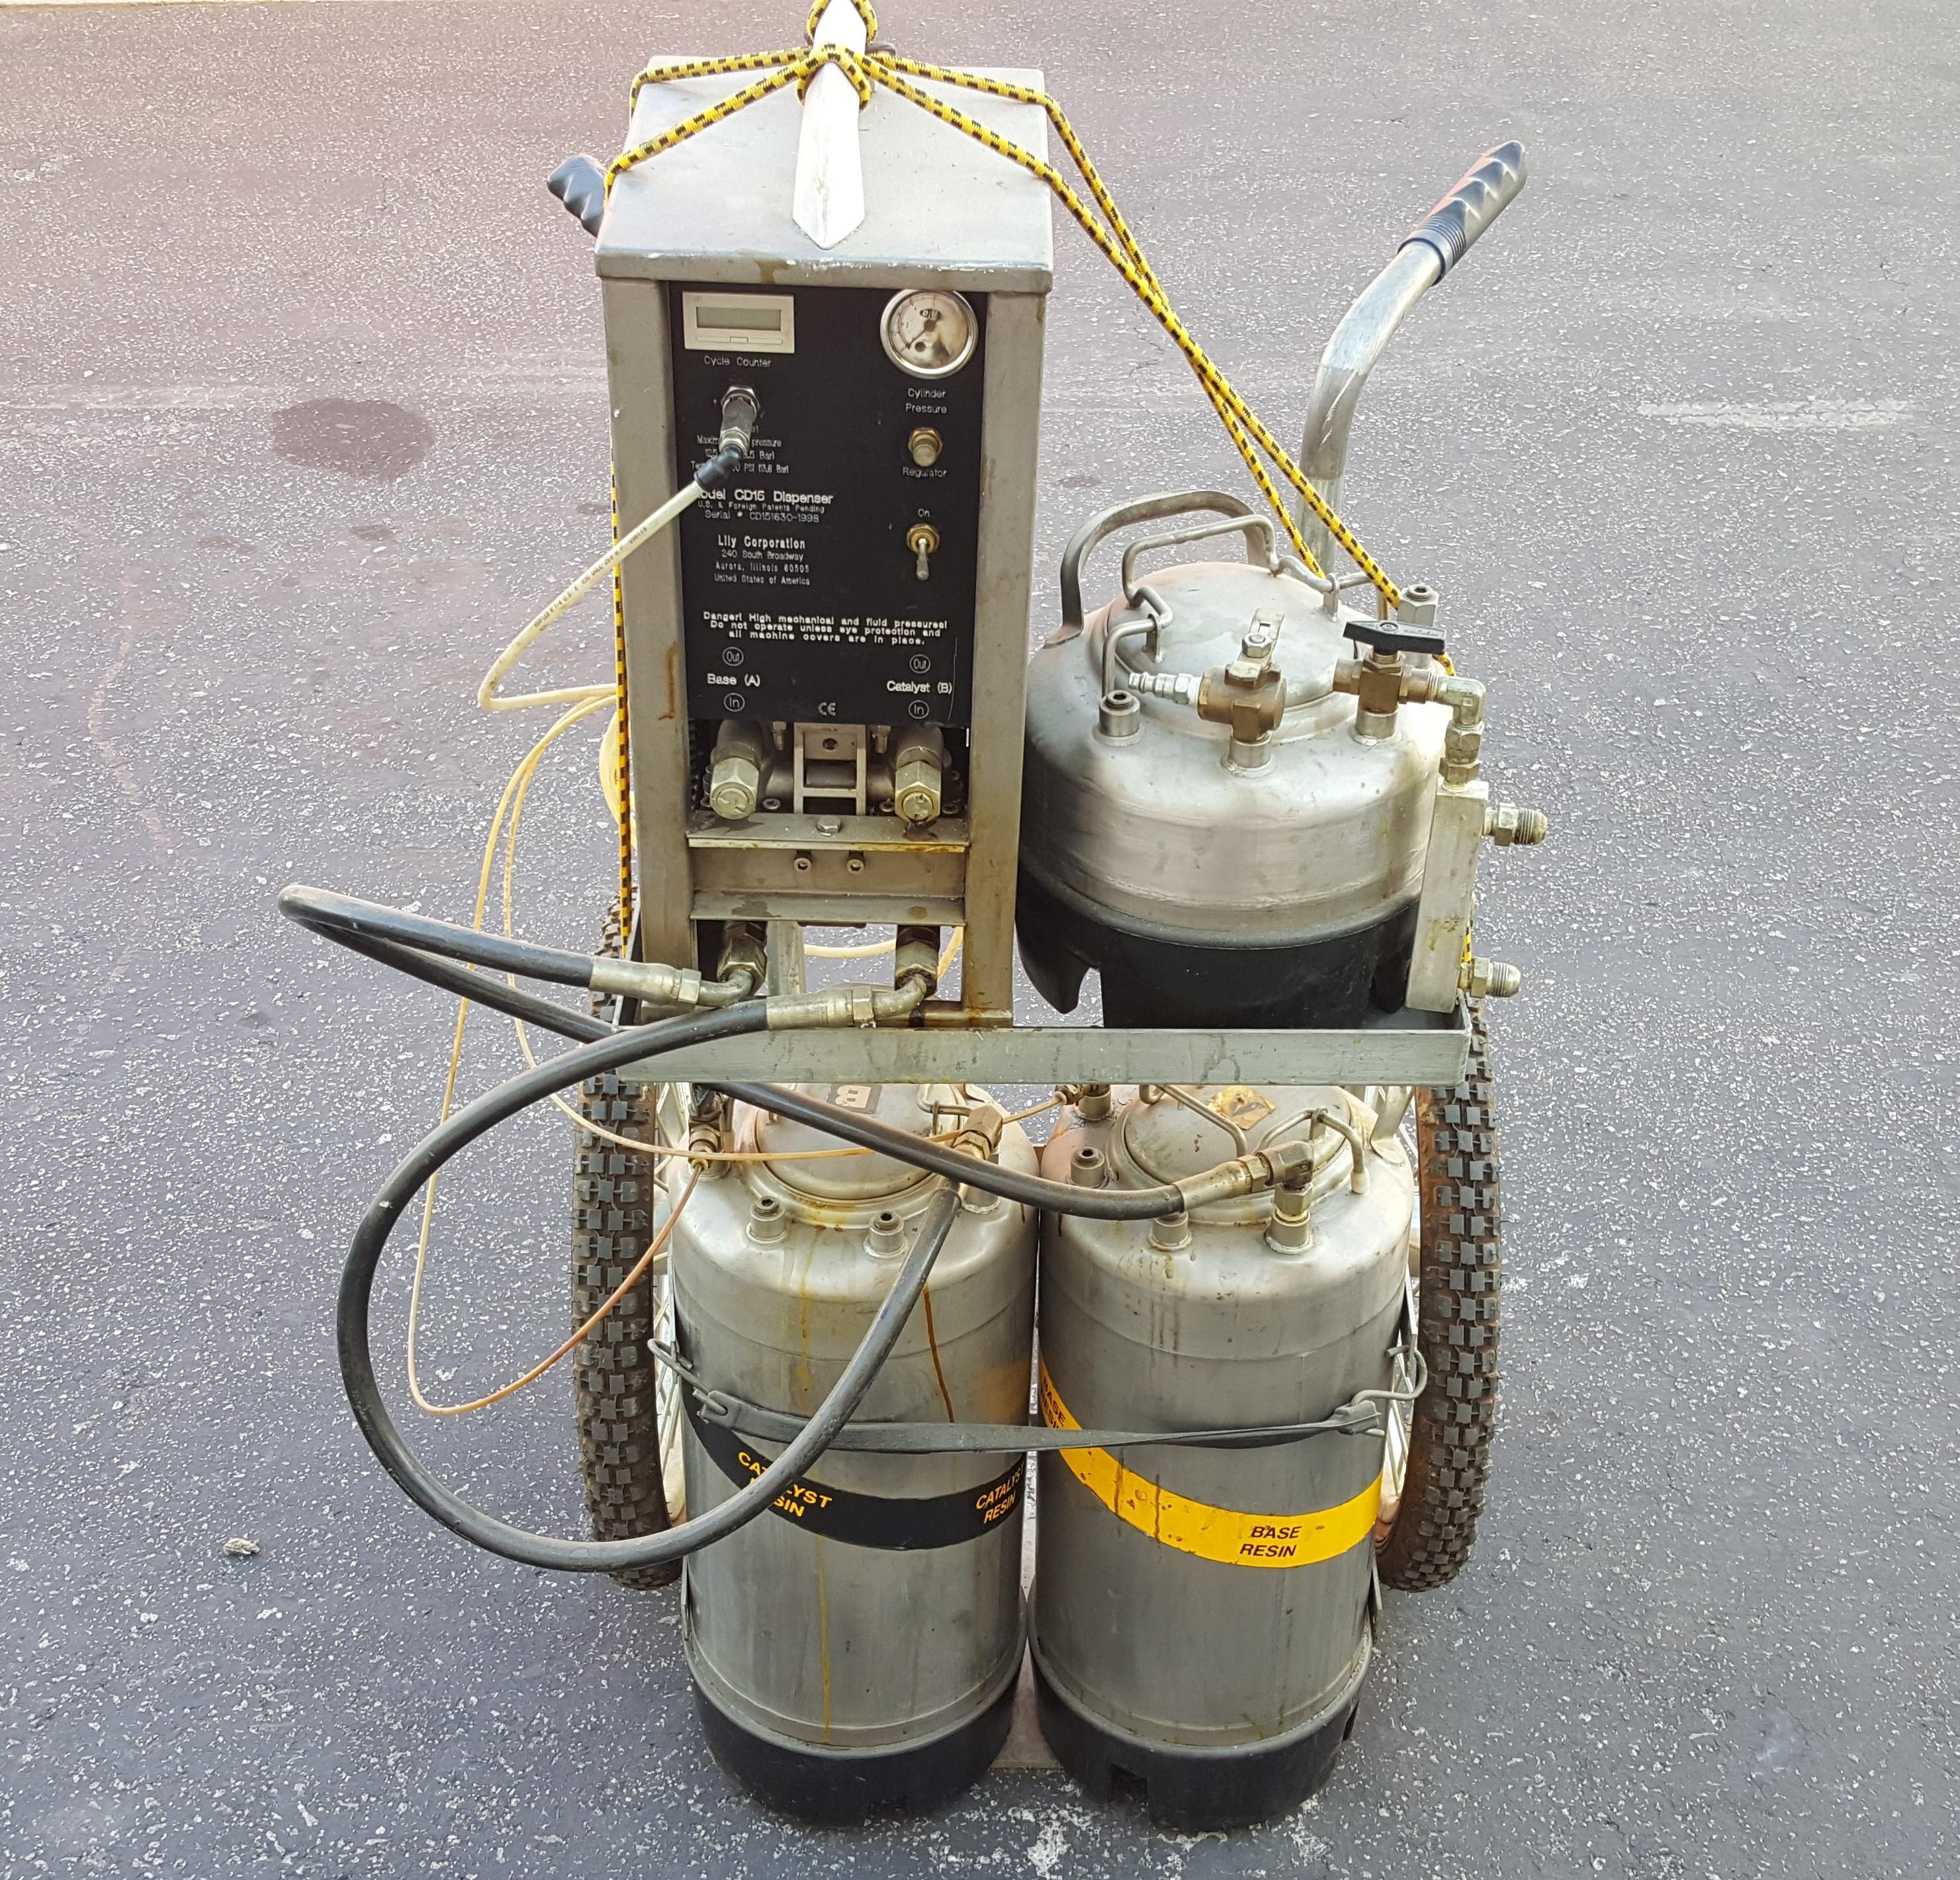 Lilycorp Model CD15 Epoxy Injector